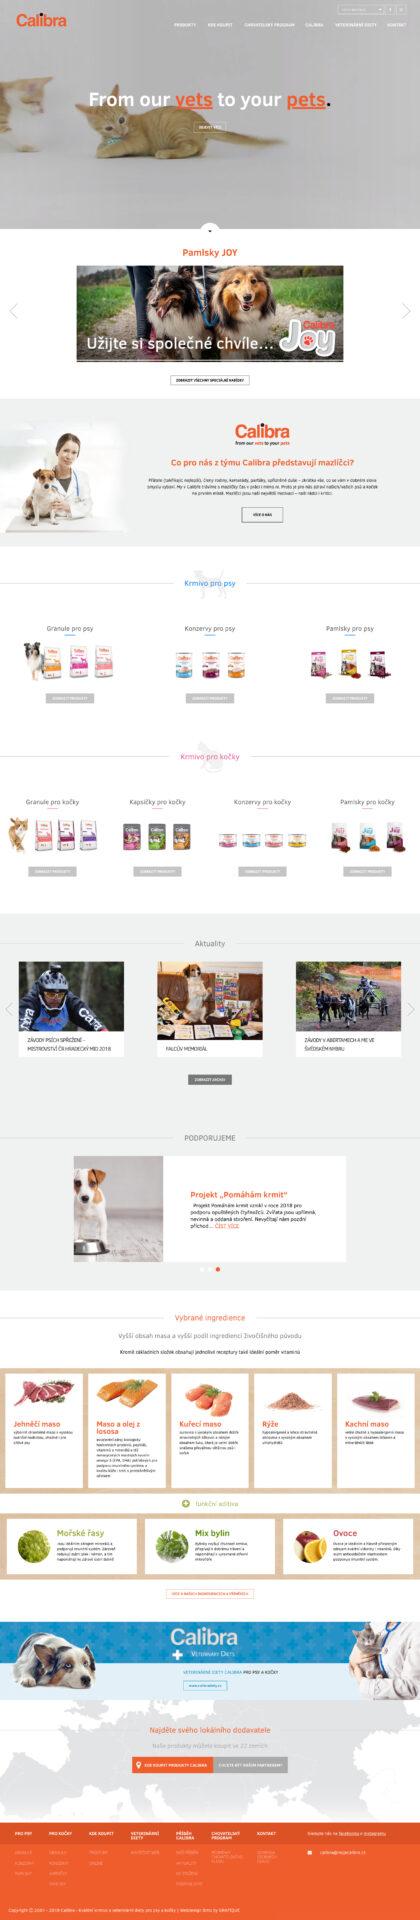 Moje Calibra website - realizace, Web design